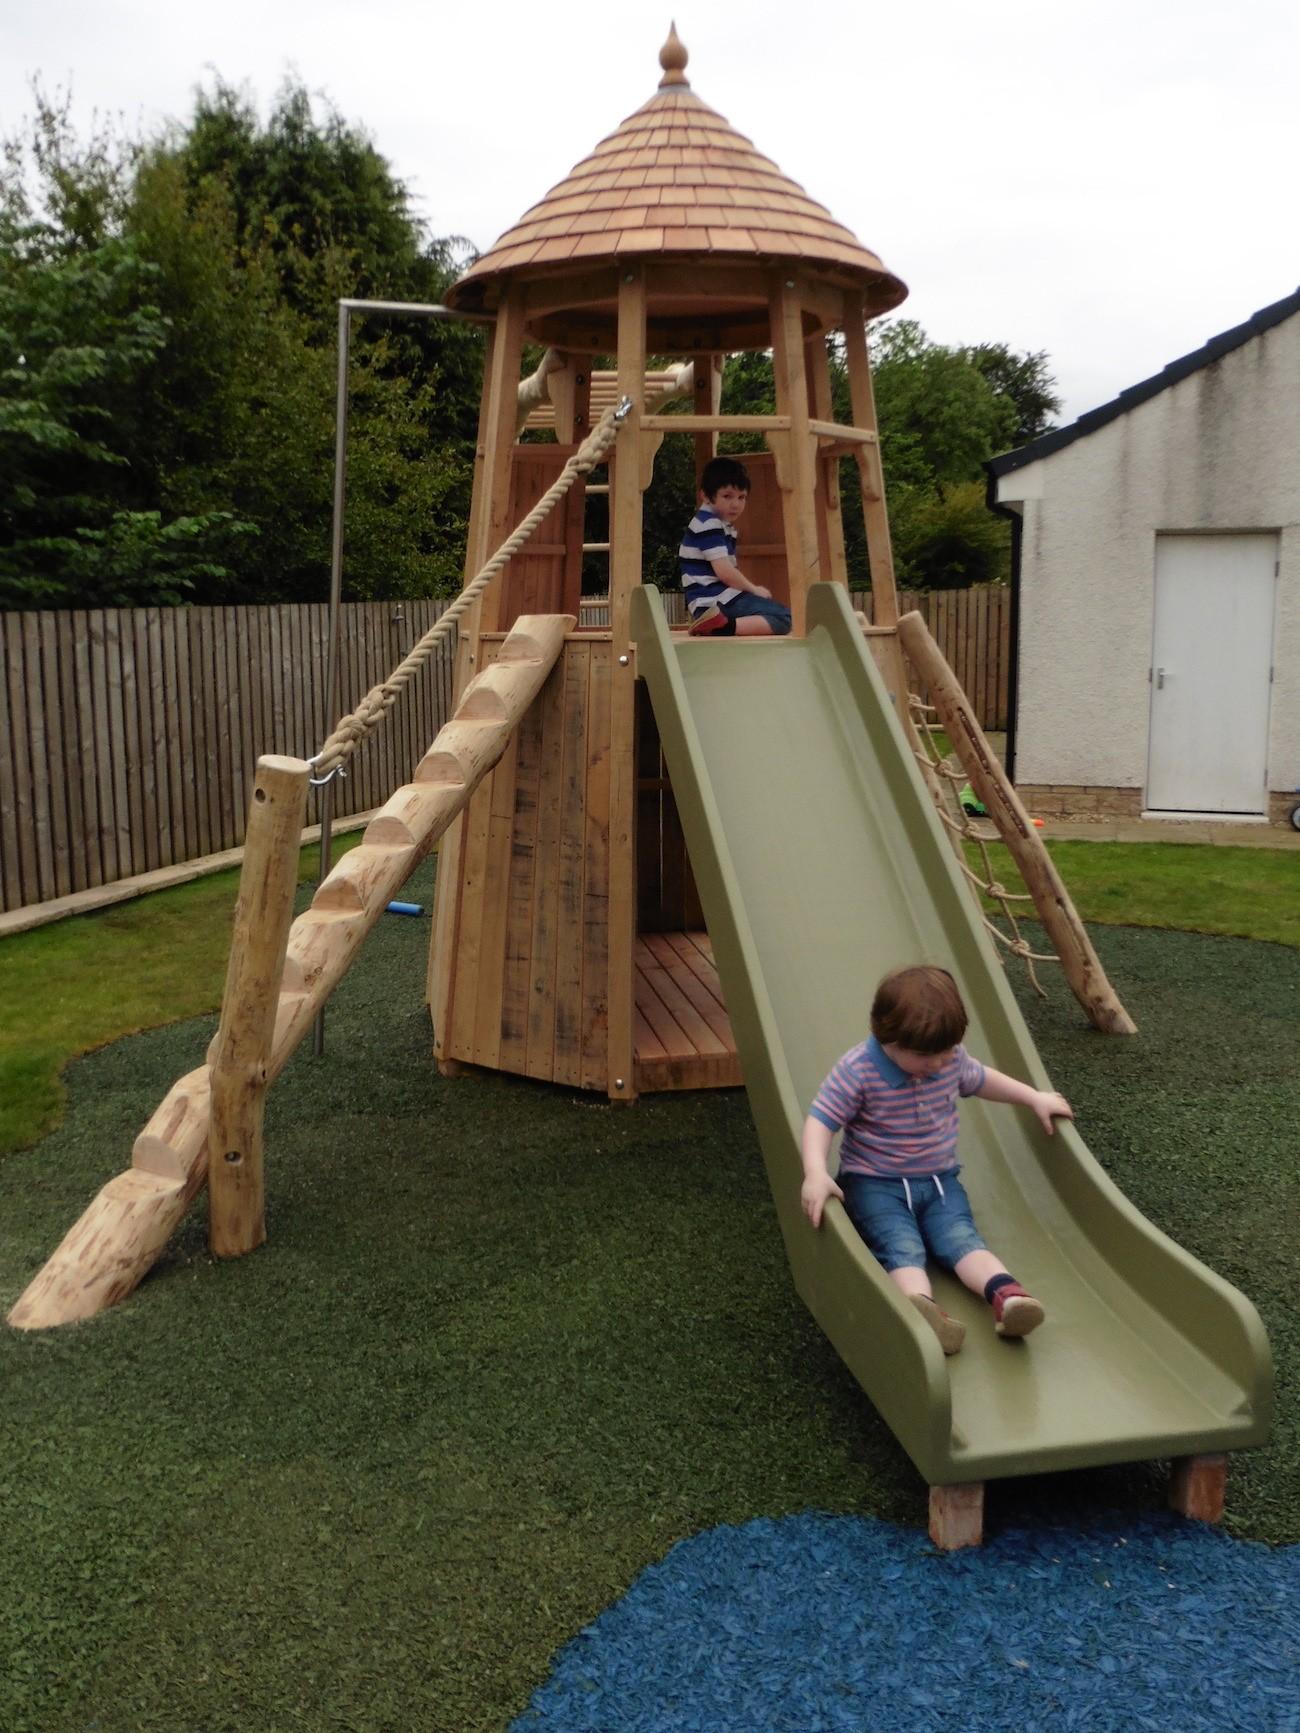 Glasgow Garden Play Tower | Flights of Fantasy